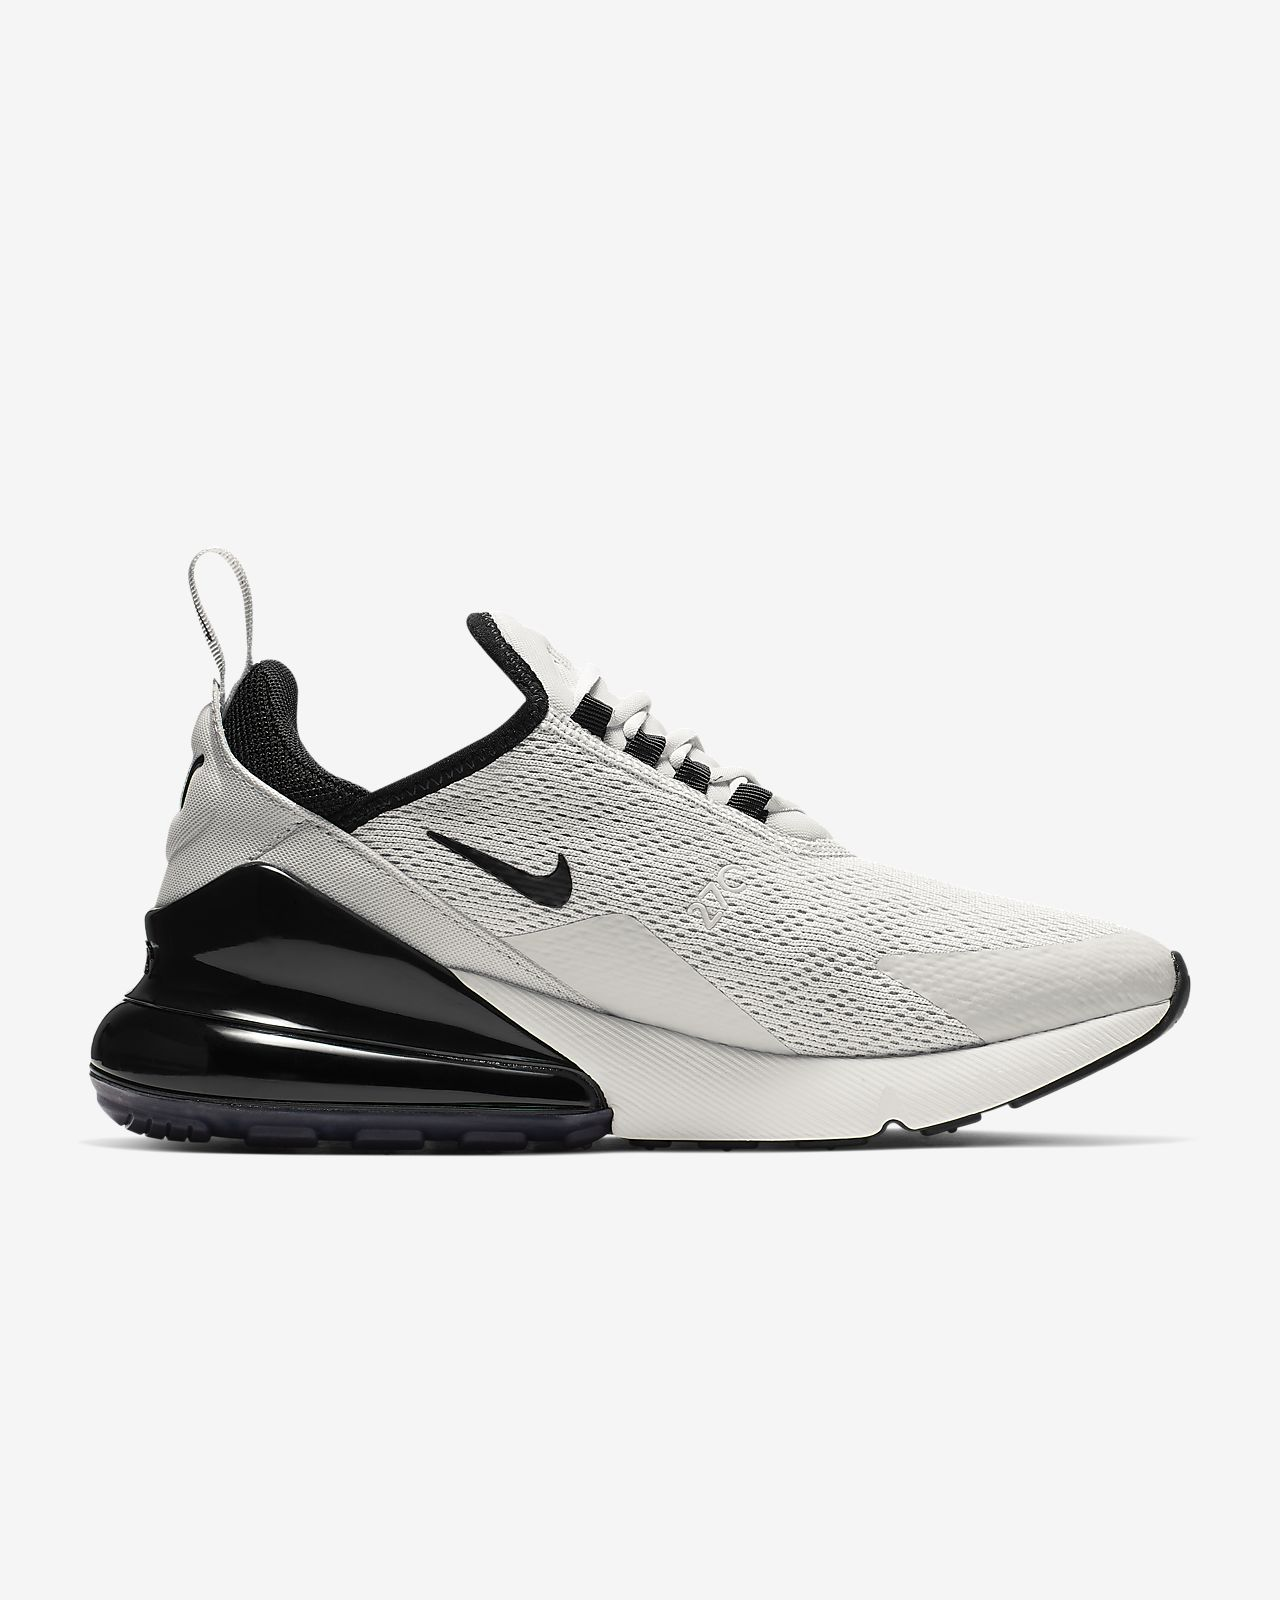 6cfe8a0b Buty damskie Nike Air Max 270. Nike.com PL